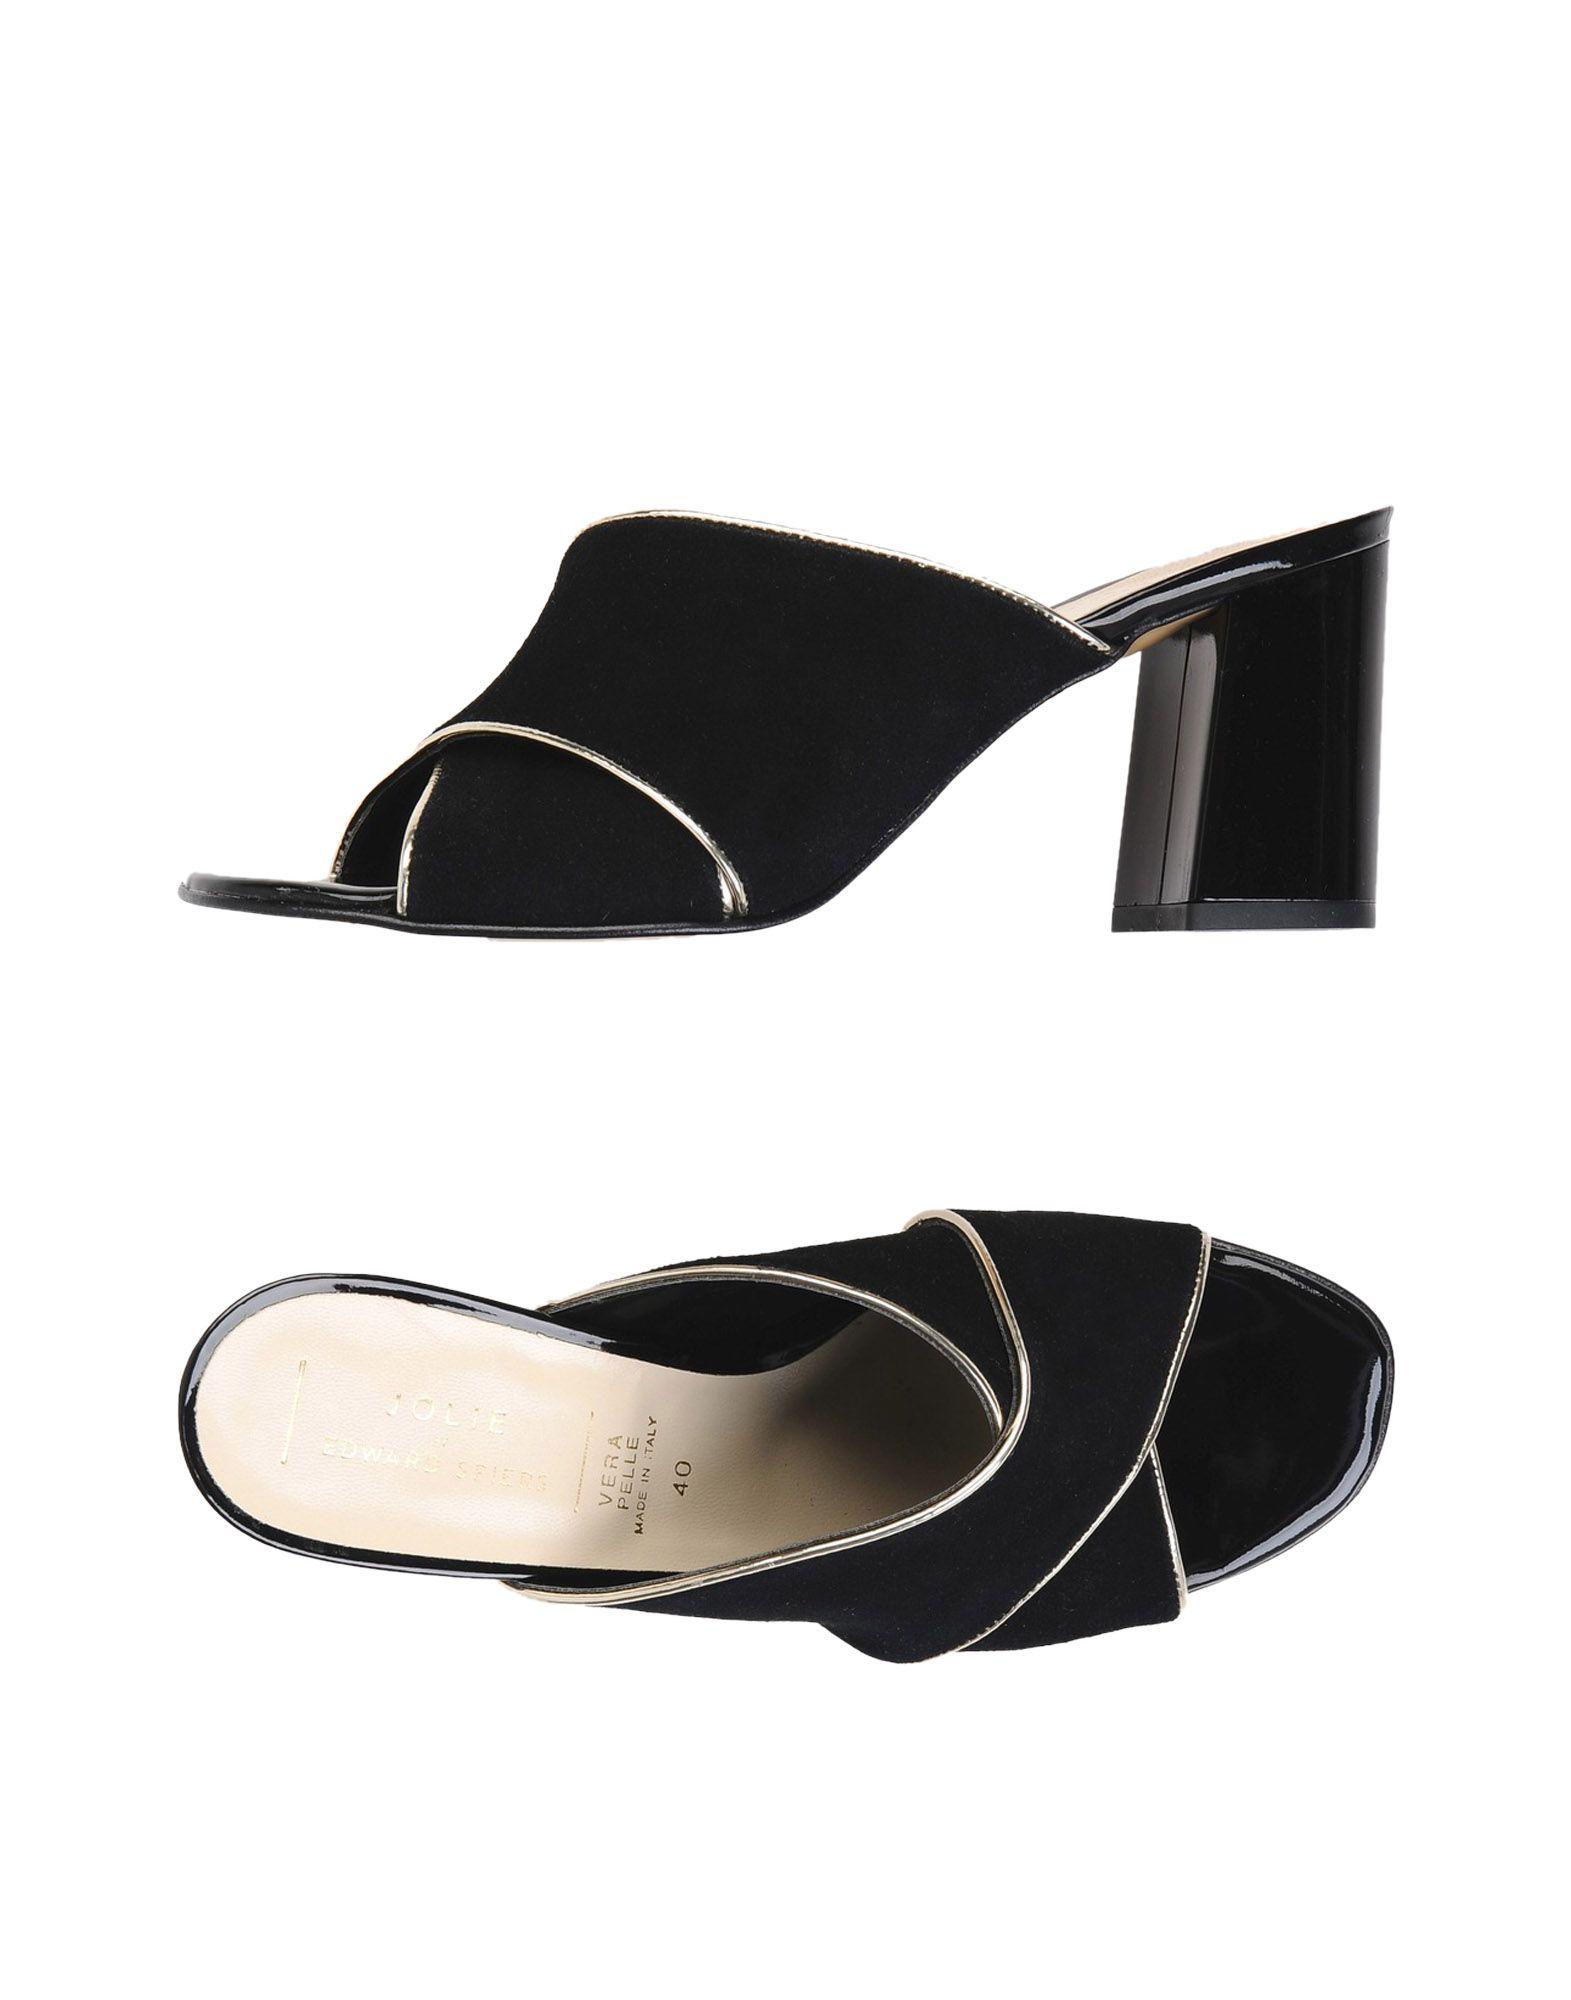 Sandales Jolie By Edward Spiers Femme - Sandales Jolie By Edward Spiers sur